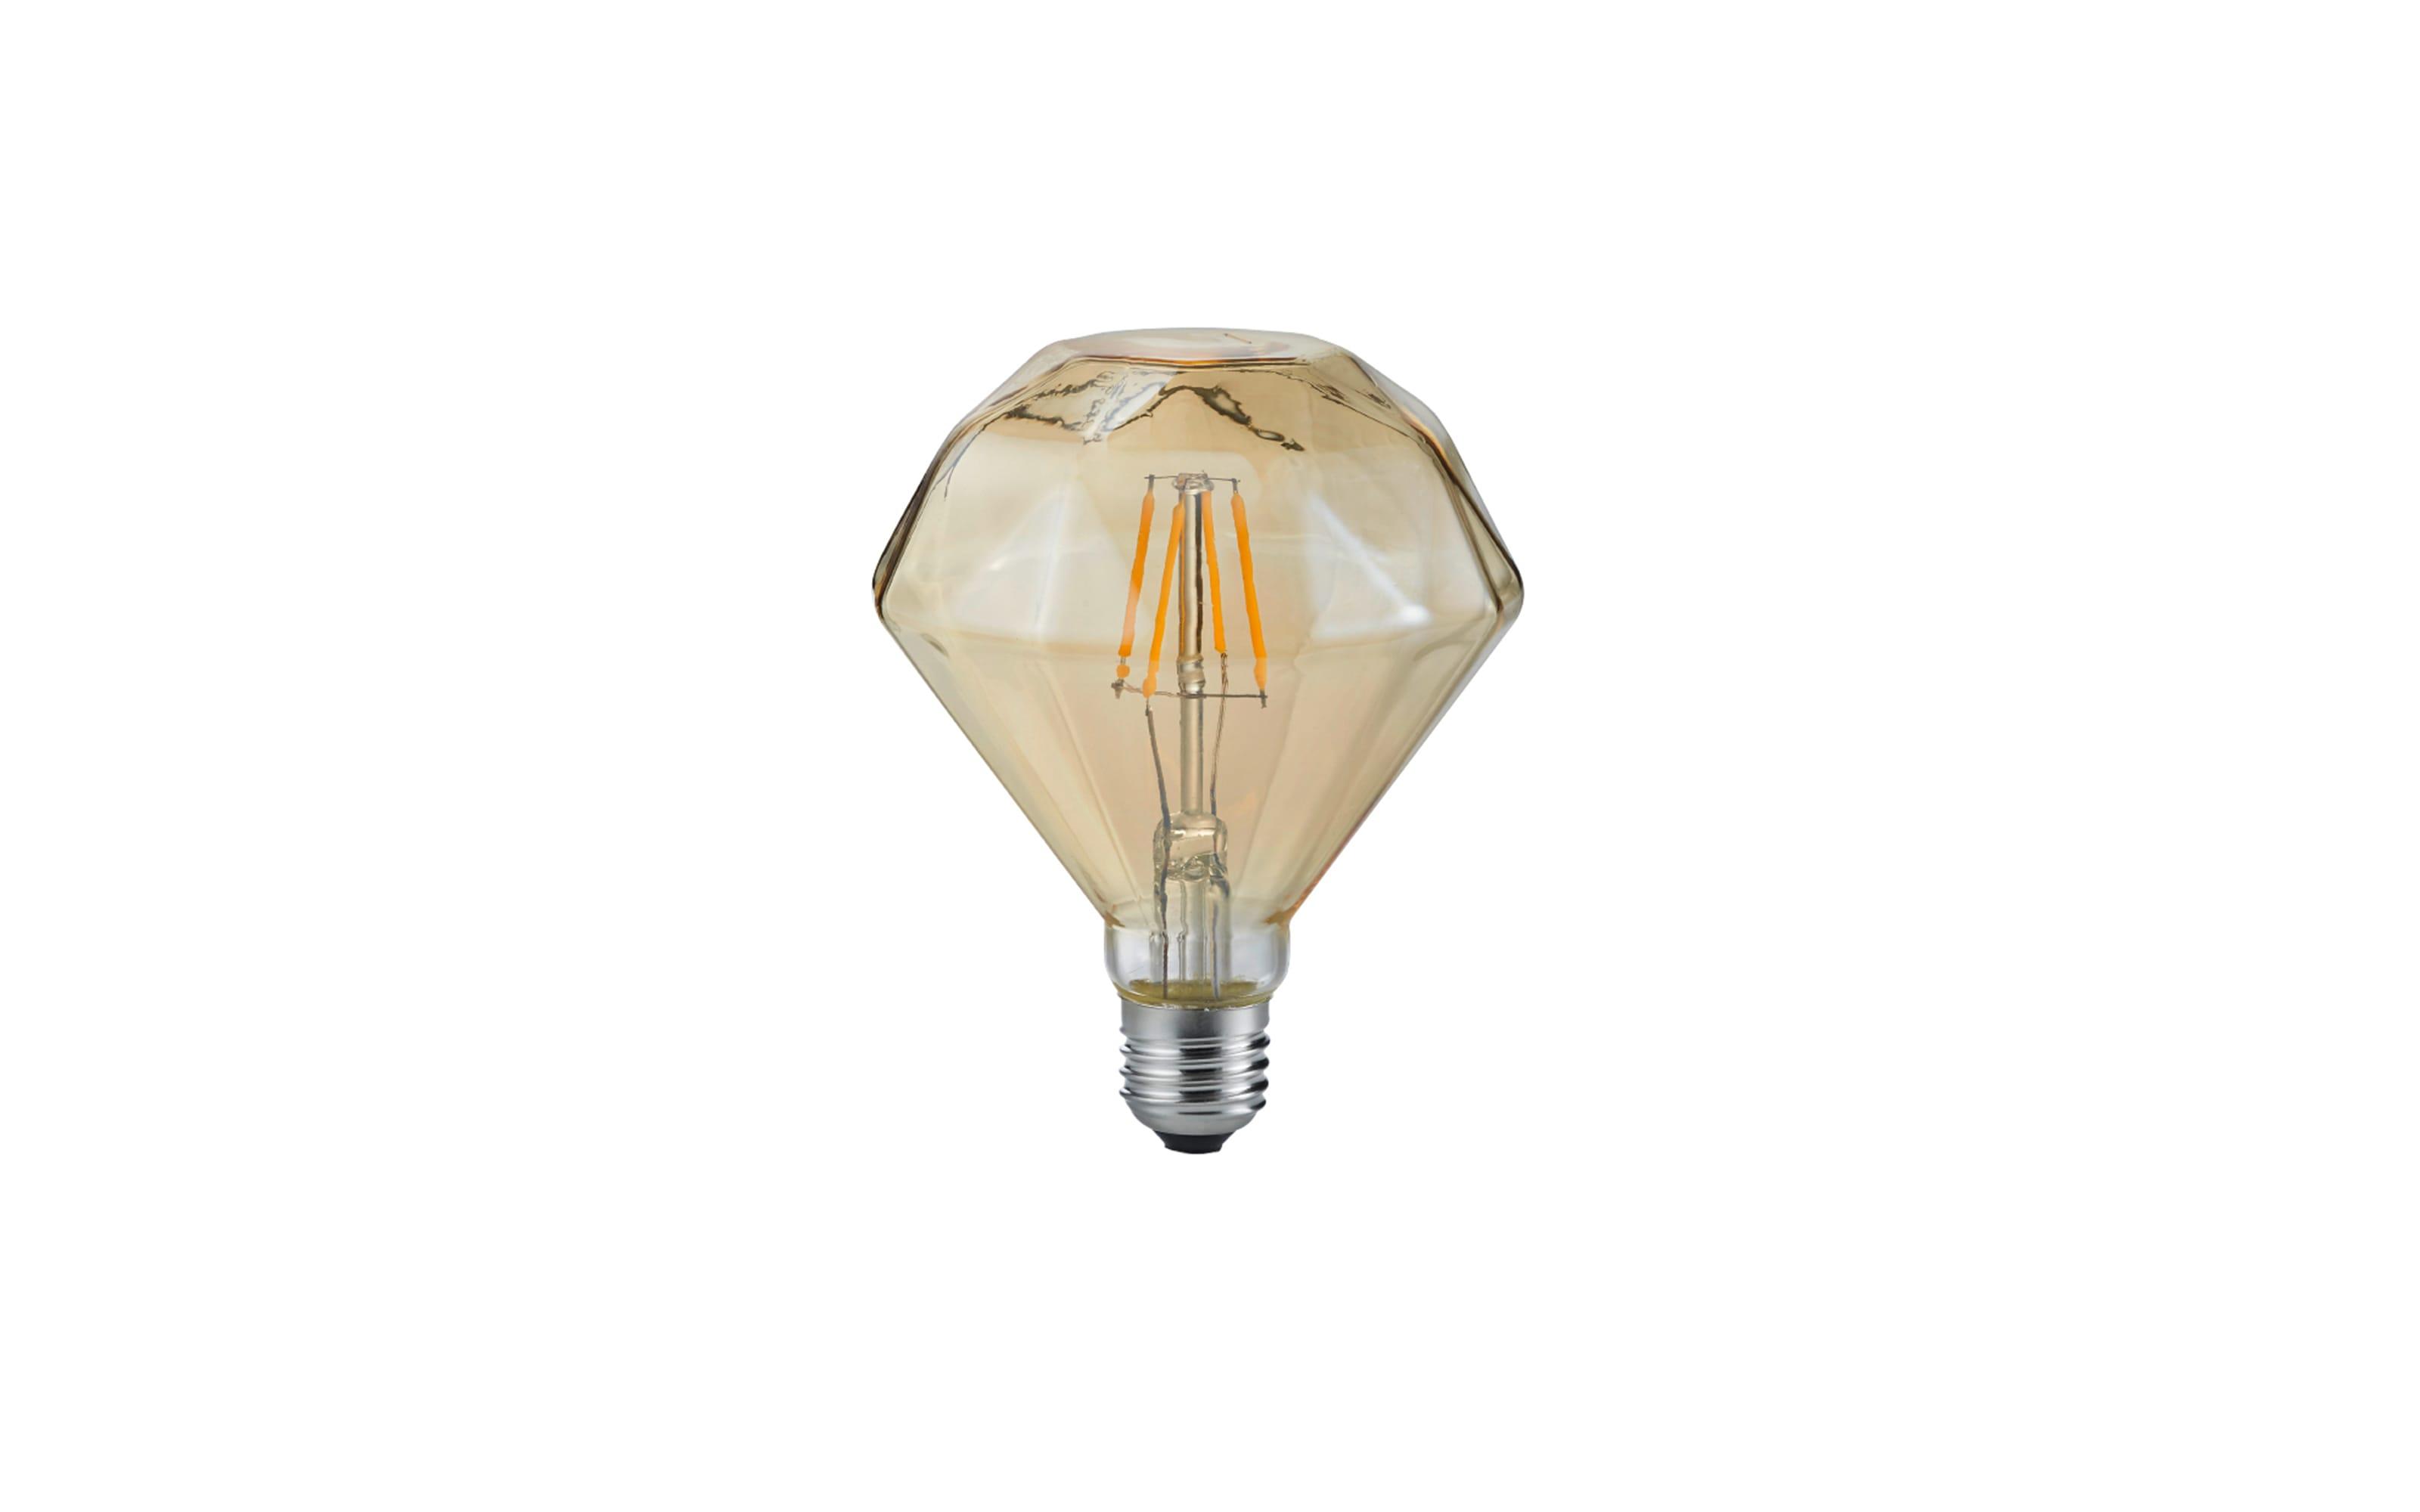 LED-Filament Diamant rund beige getönt, 4W / E27